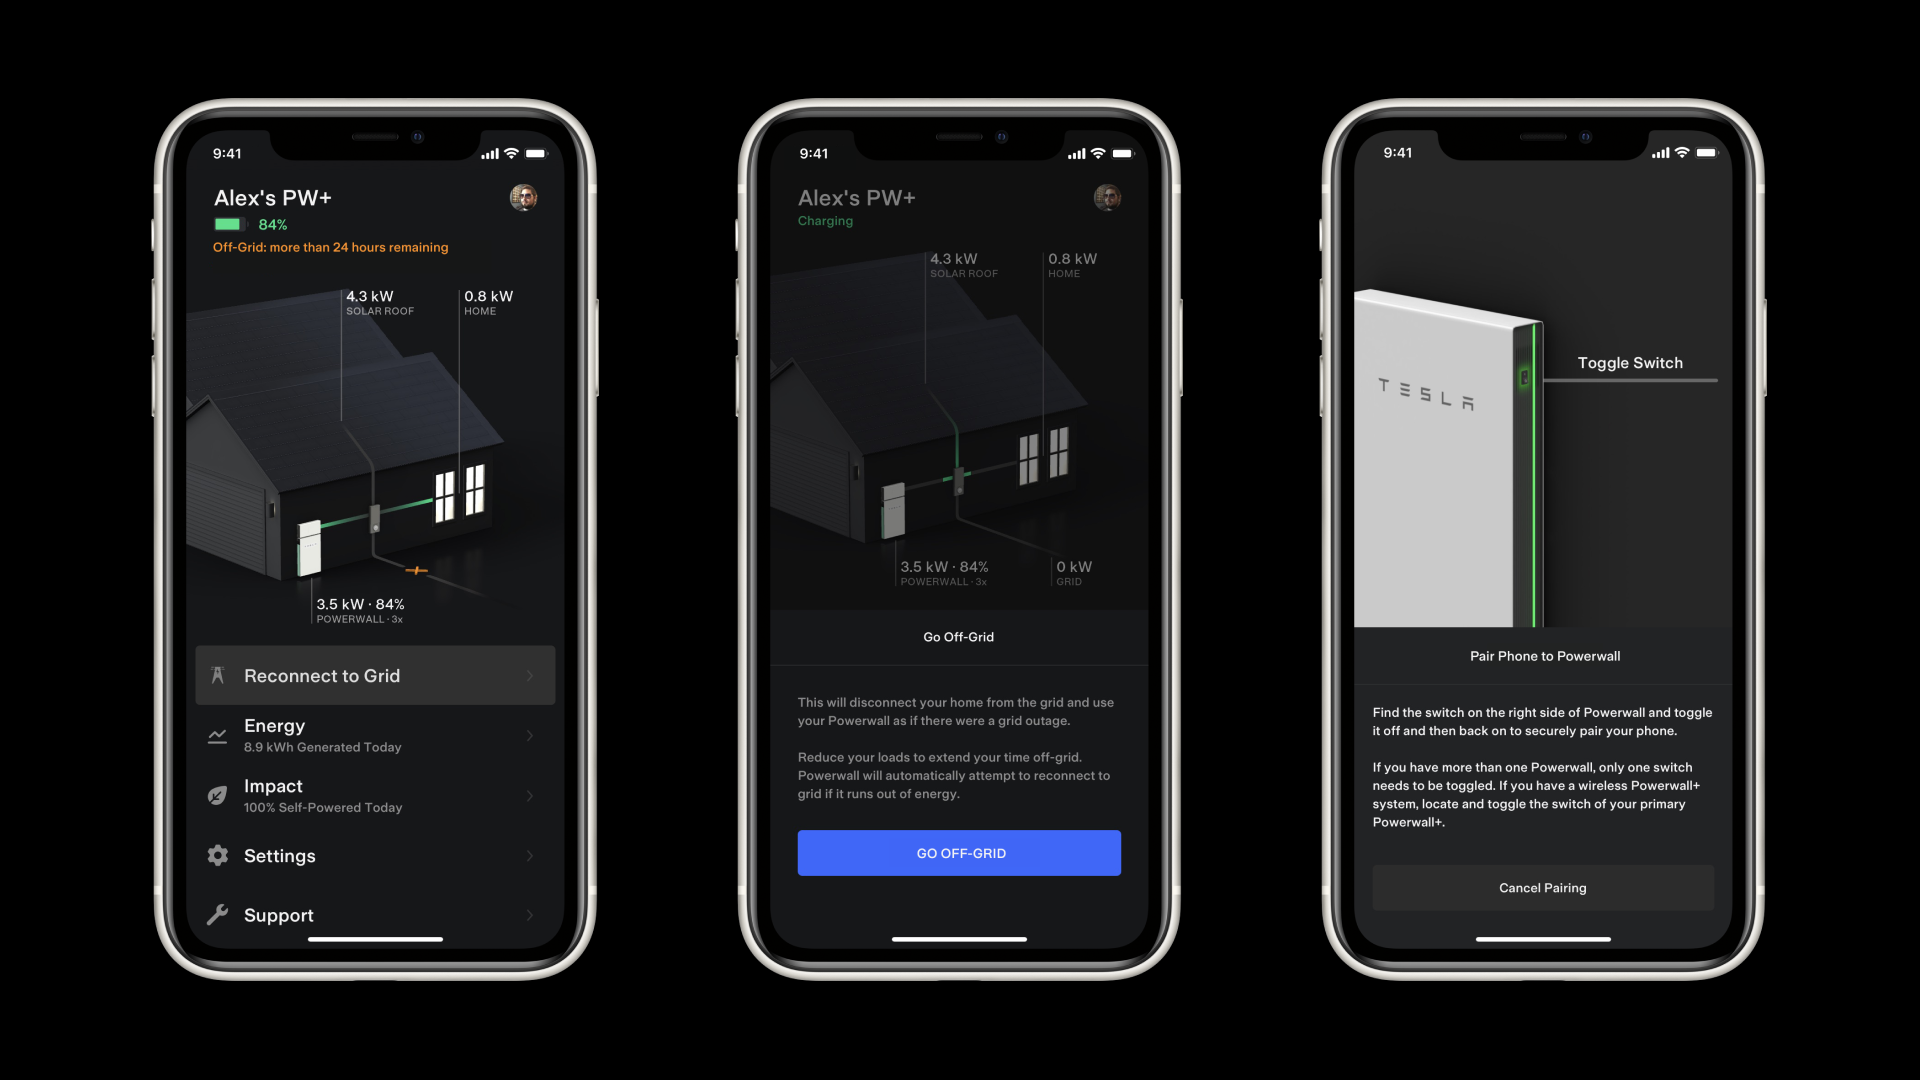 Tesla Mobile App Go Off-Grid Feature